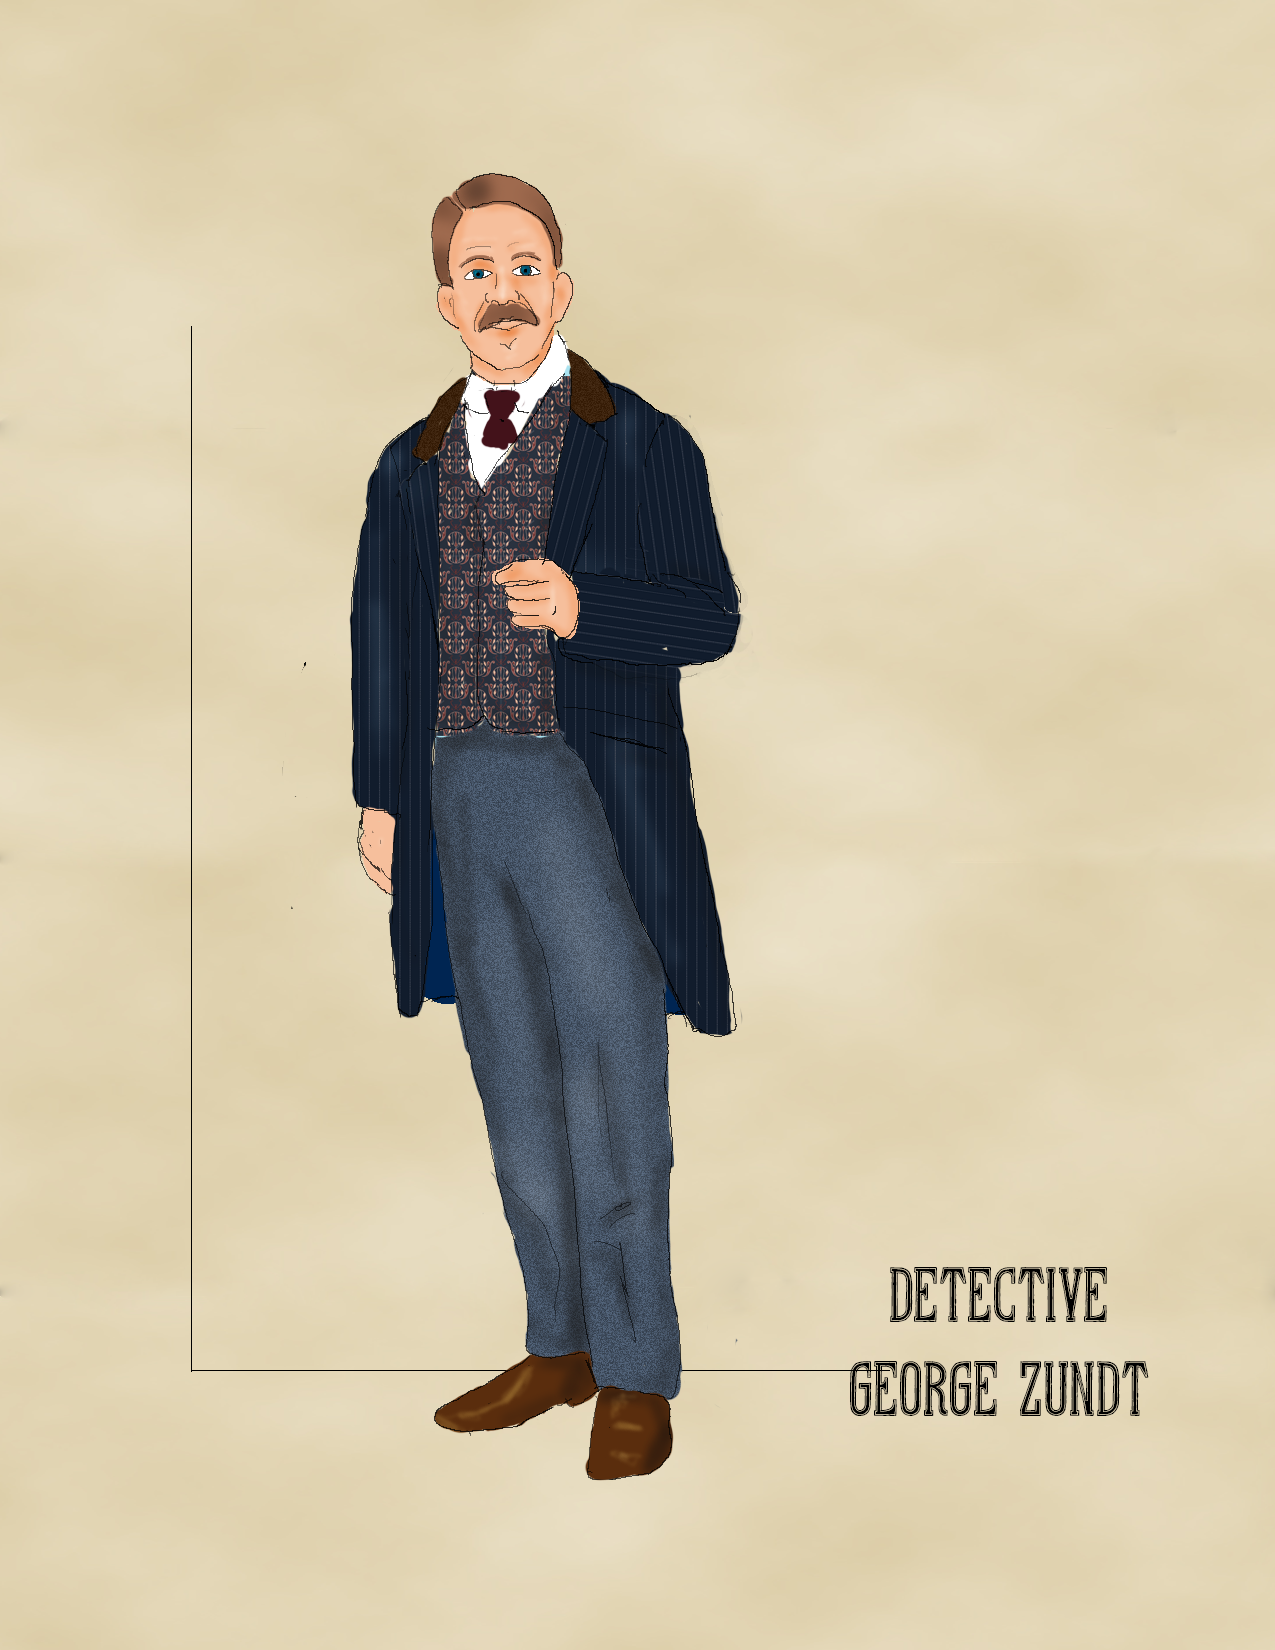 Detective George Zundt